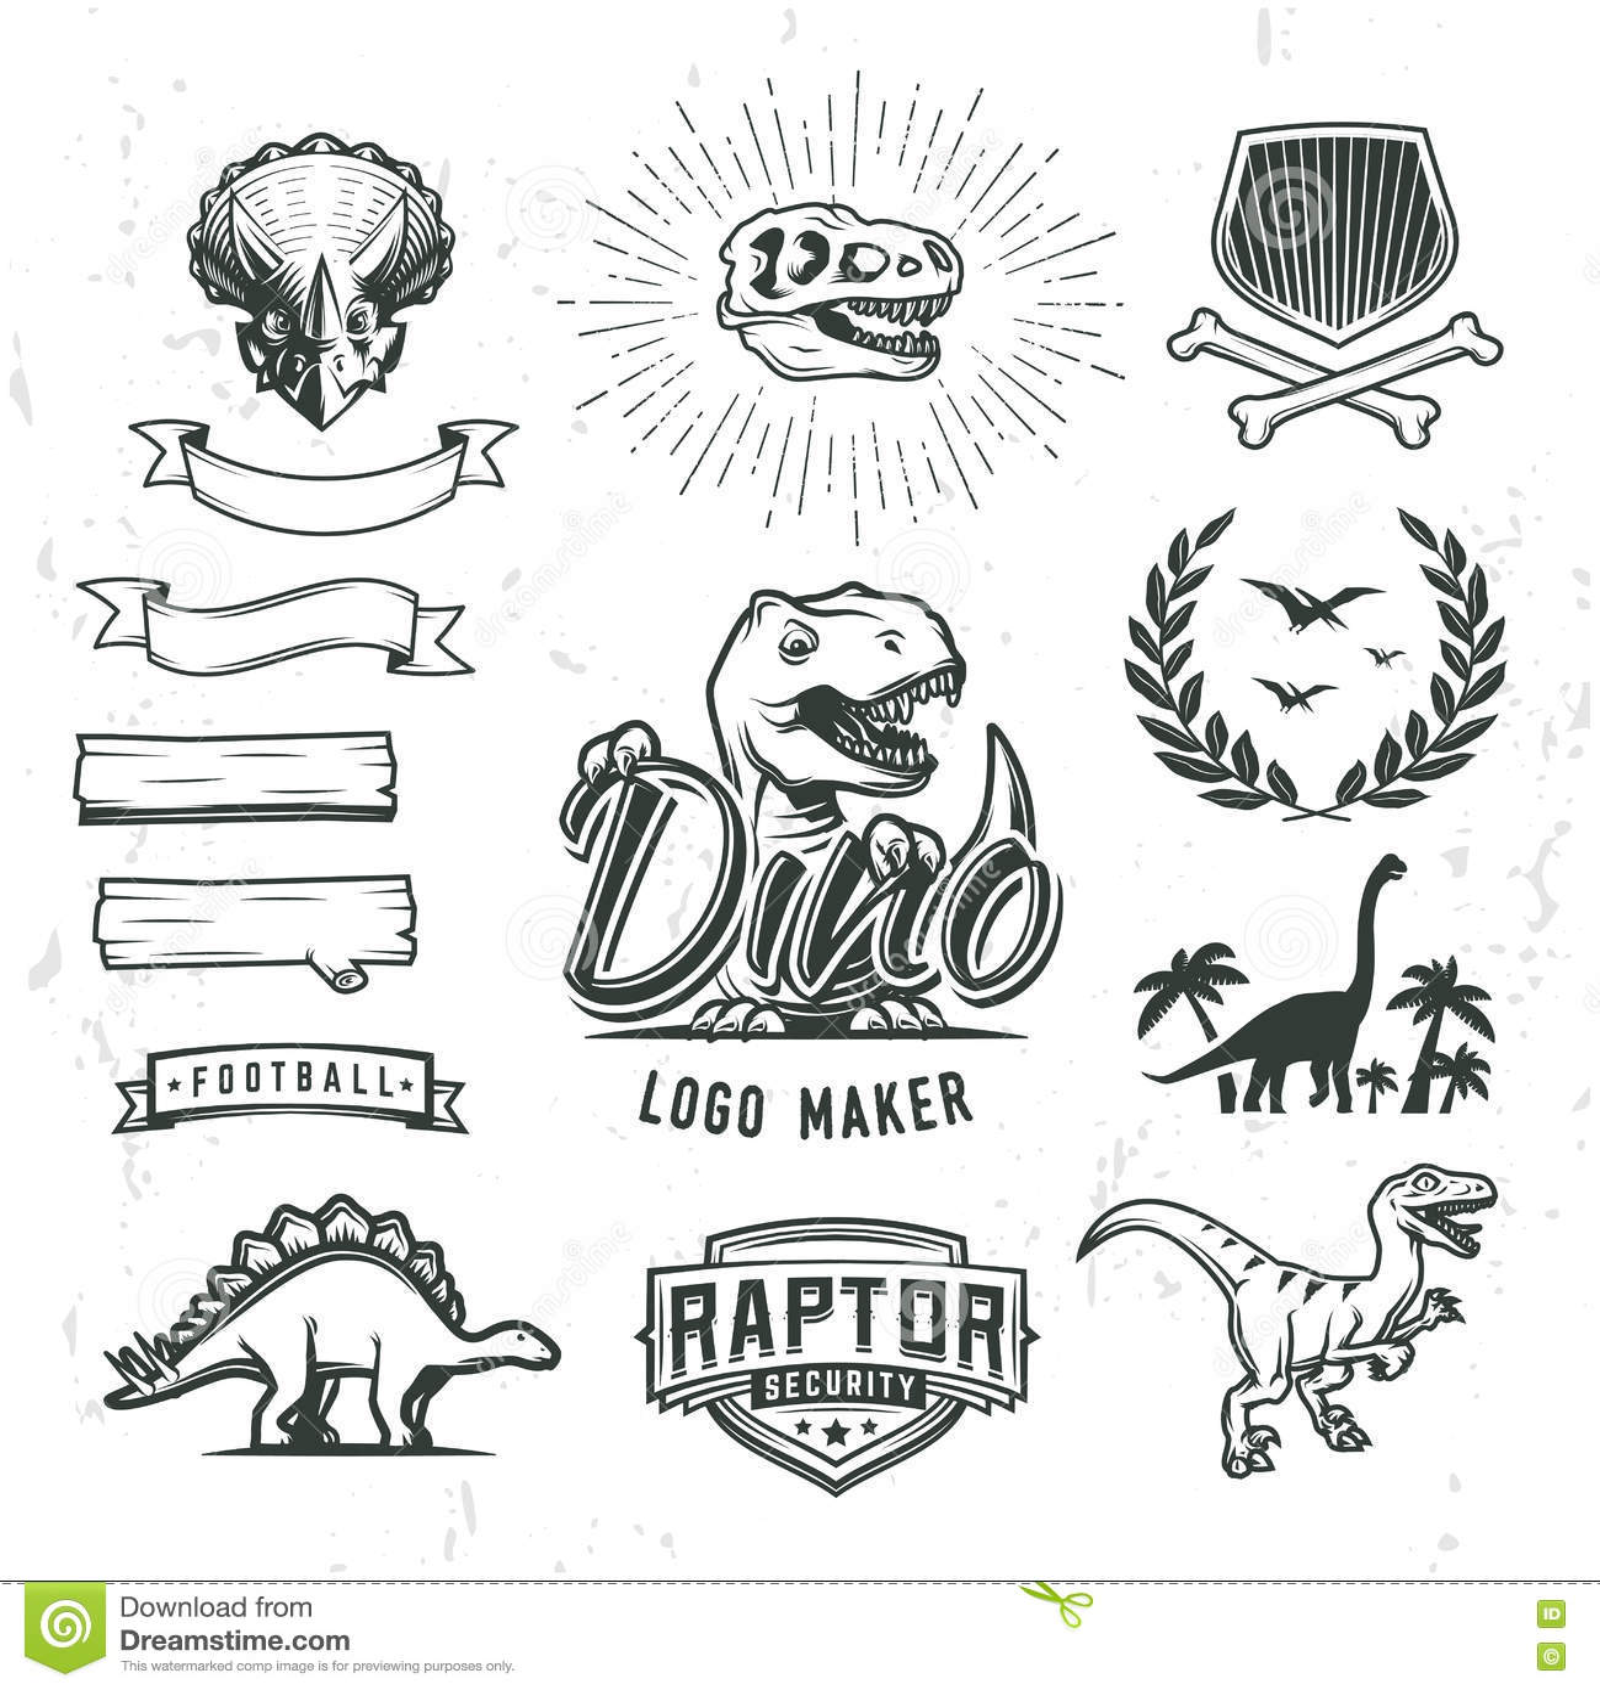 Printable t-rex head template.